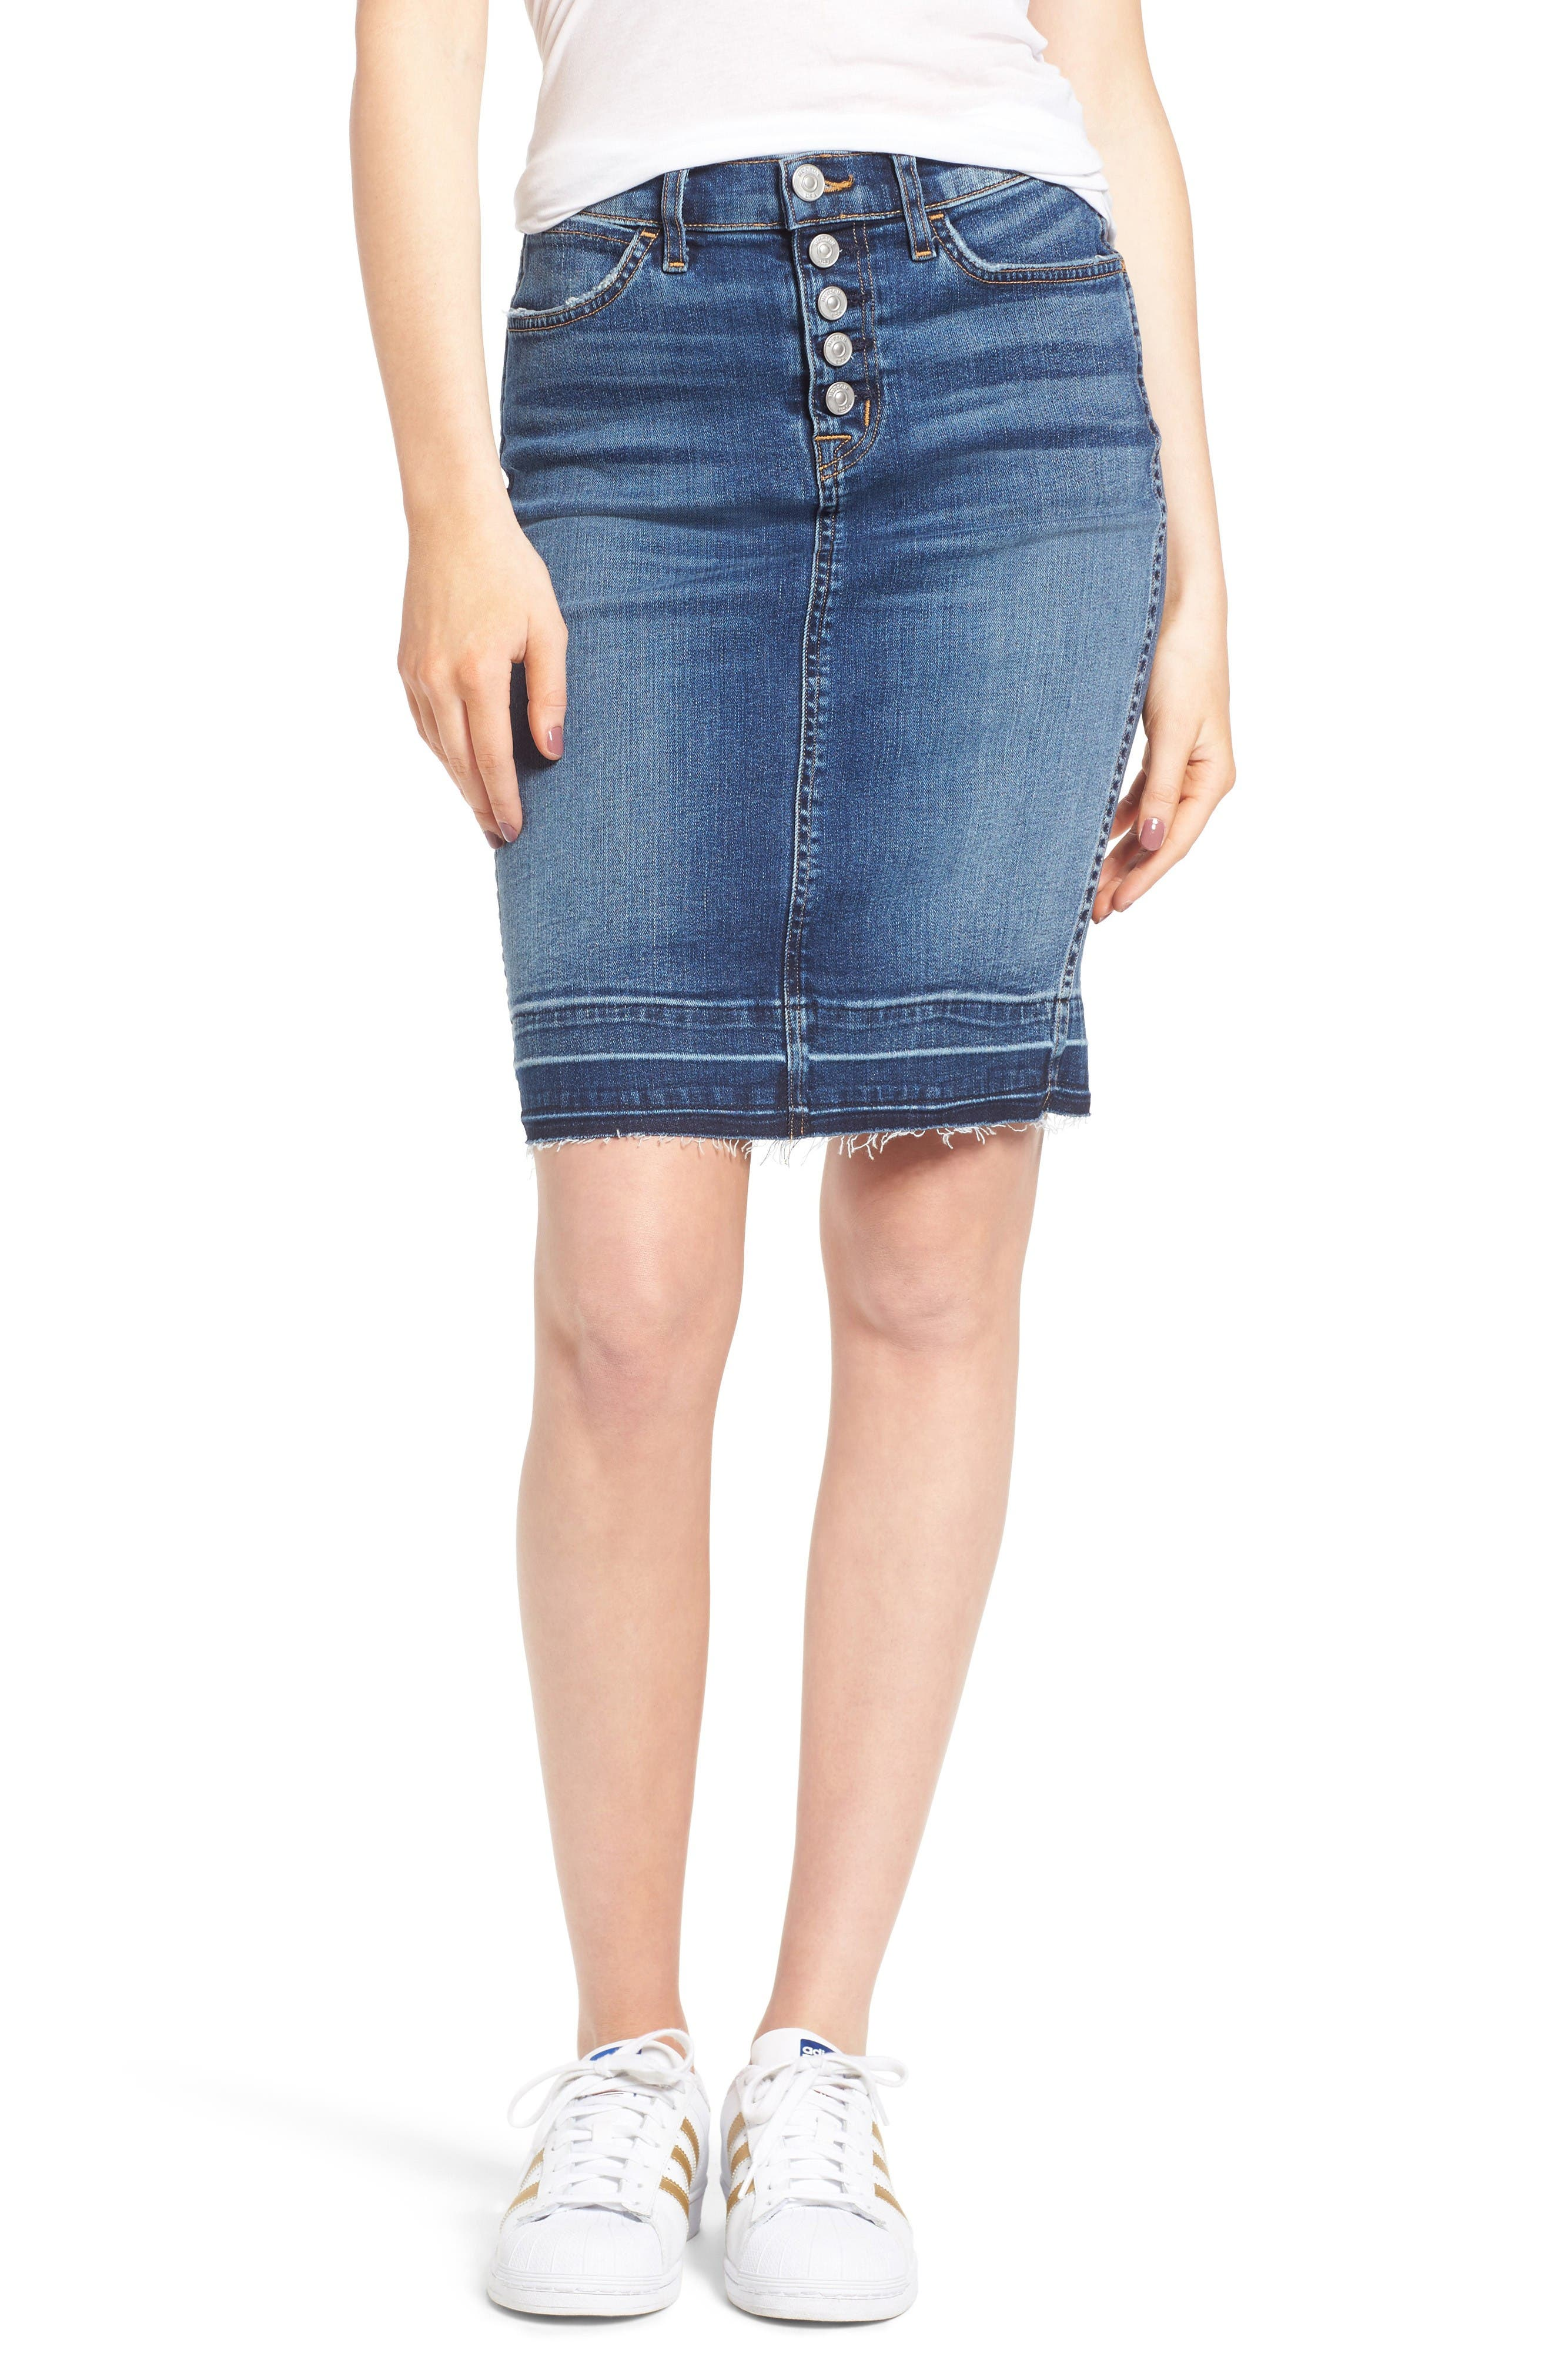 Hudson Jeans Remi High Waist Released Hem Denim Pencil Skirt